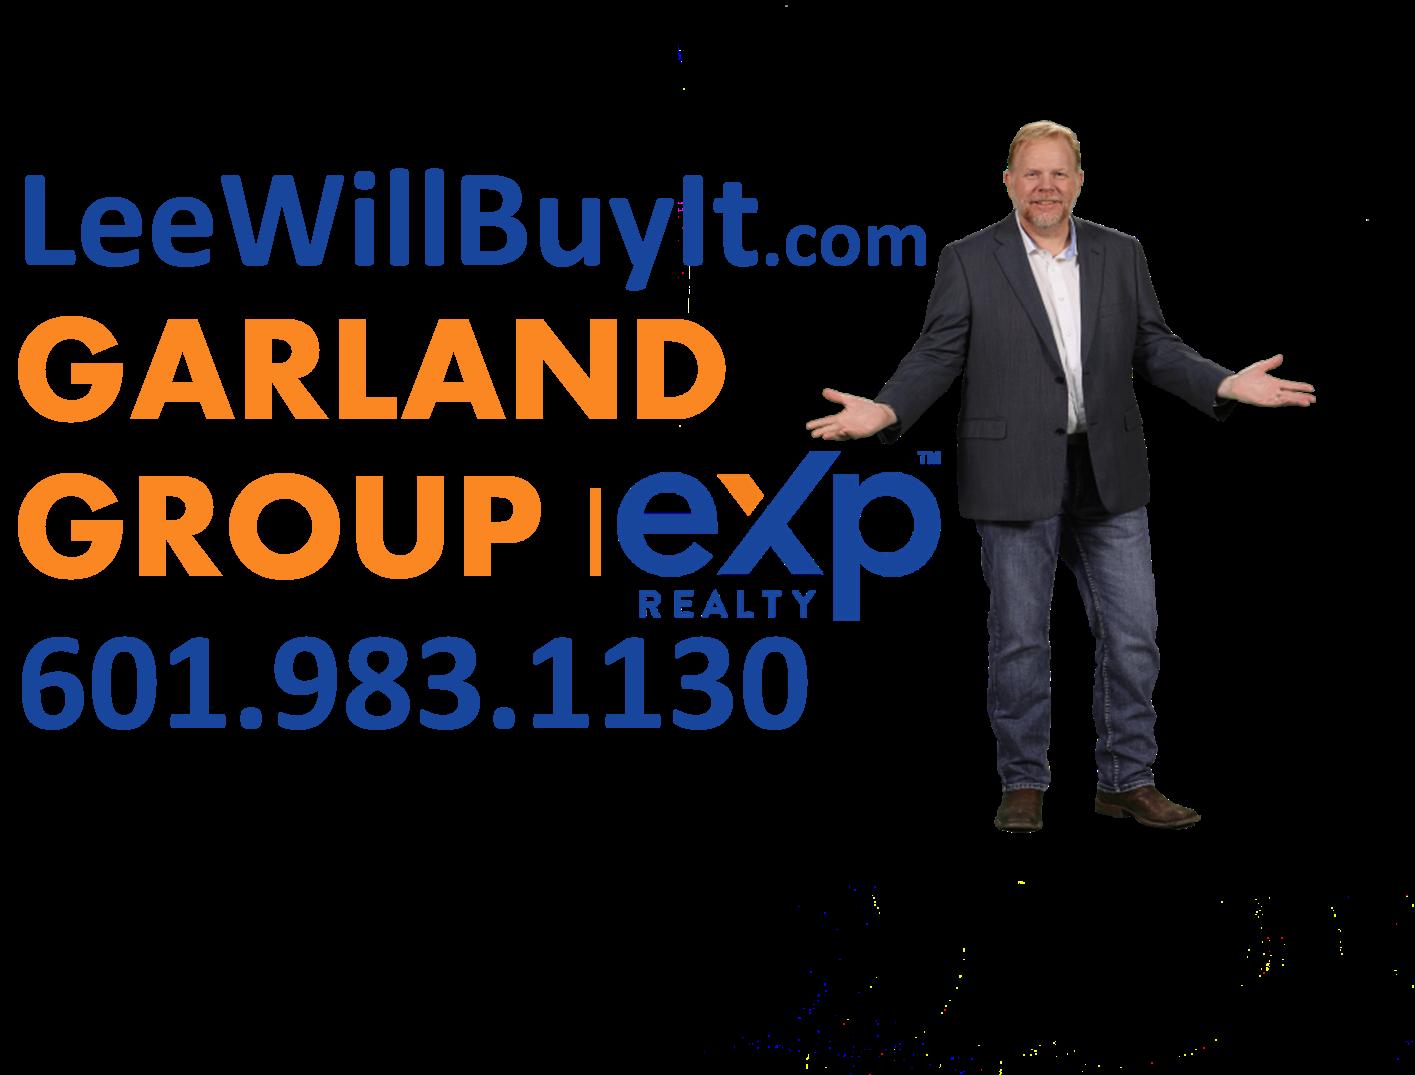 Garland Group - eXp logo